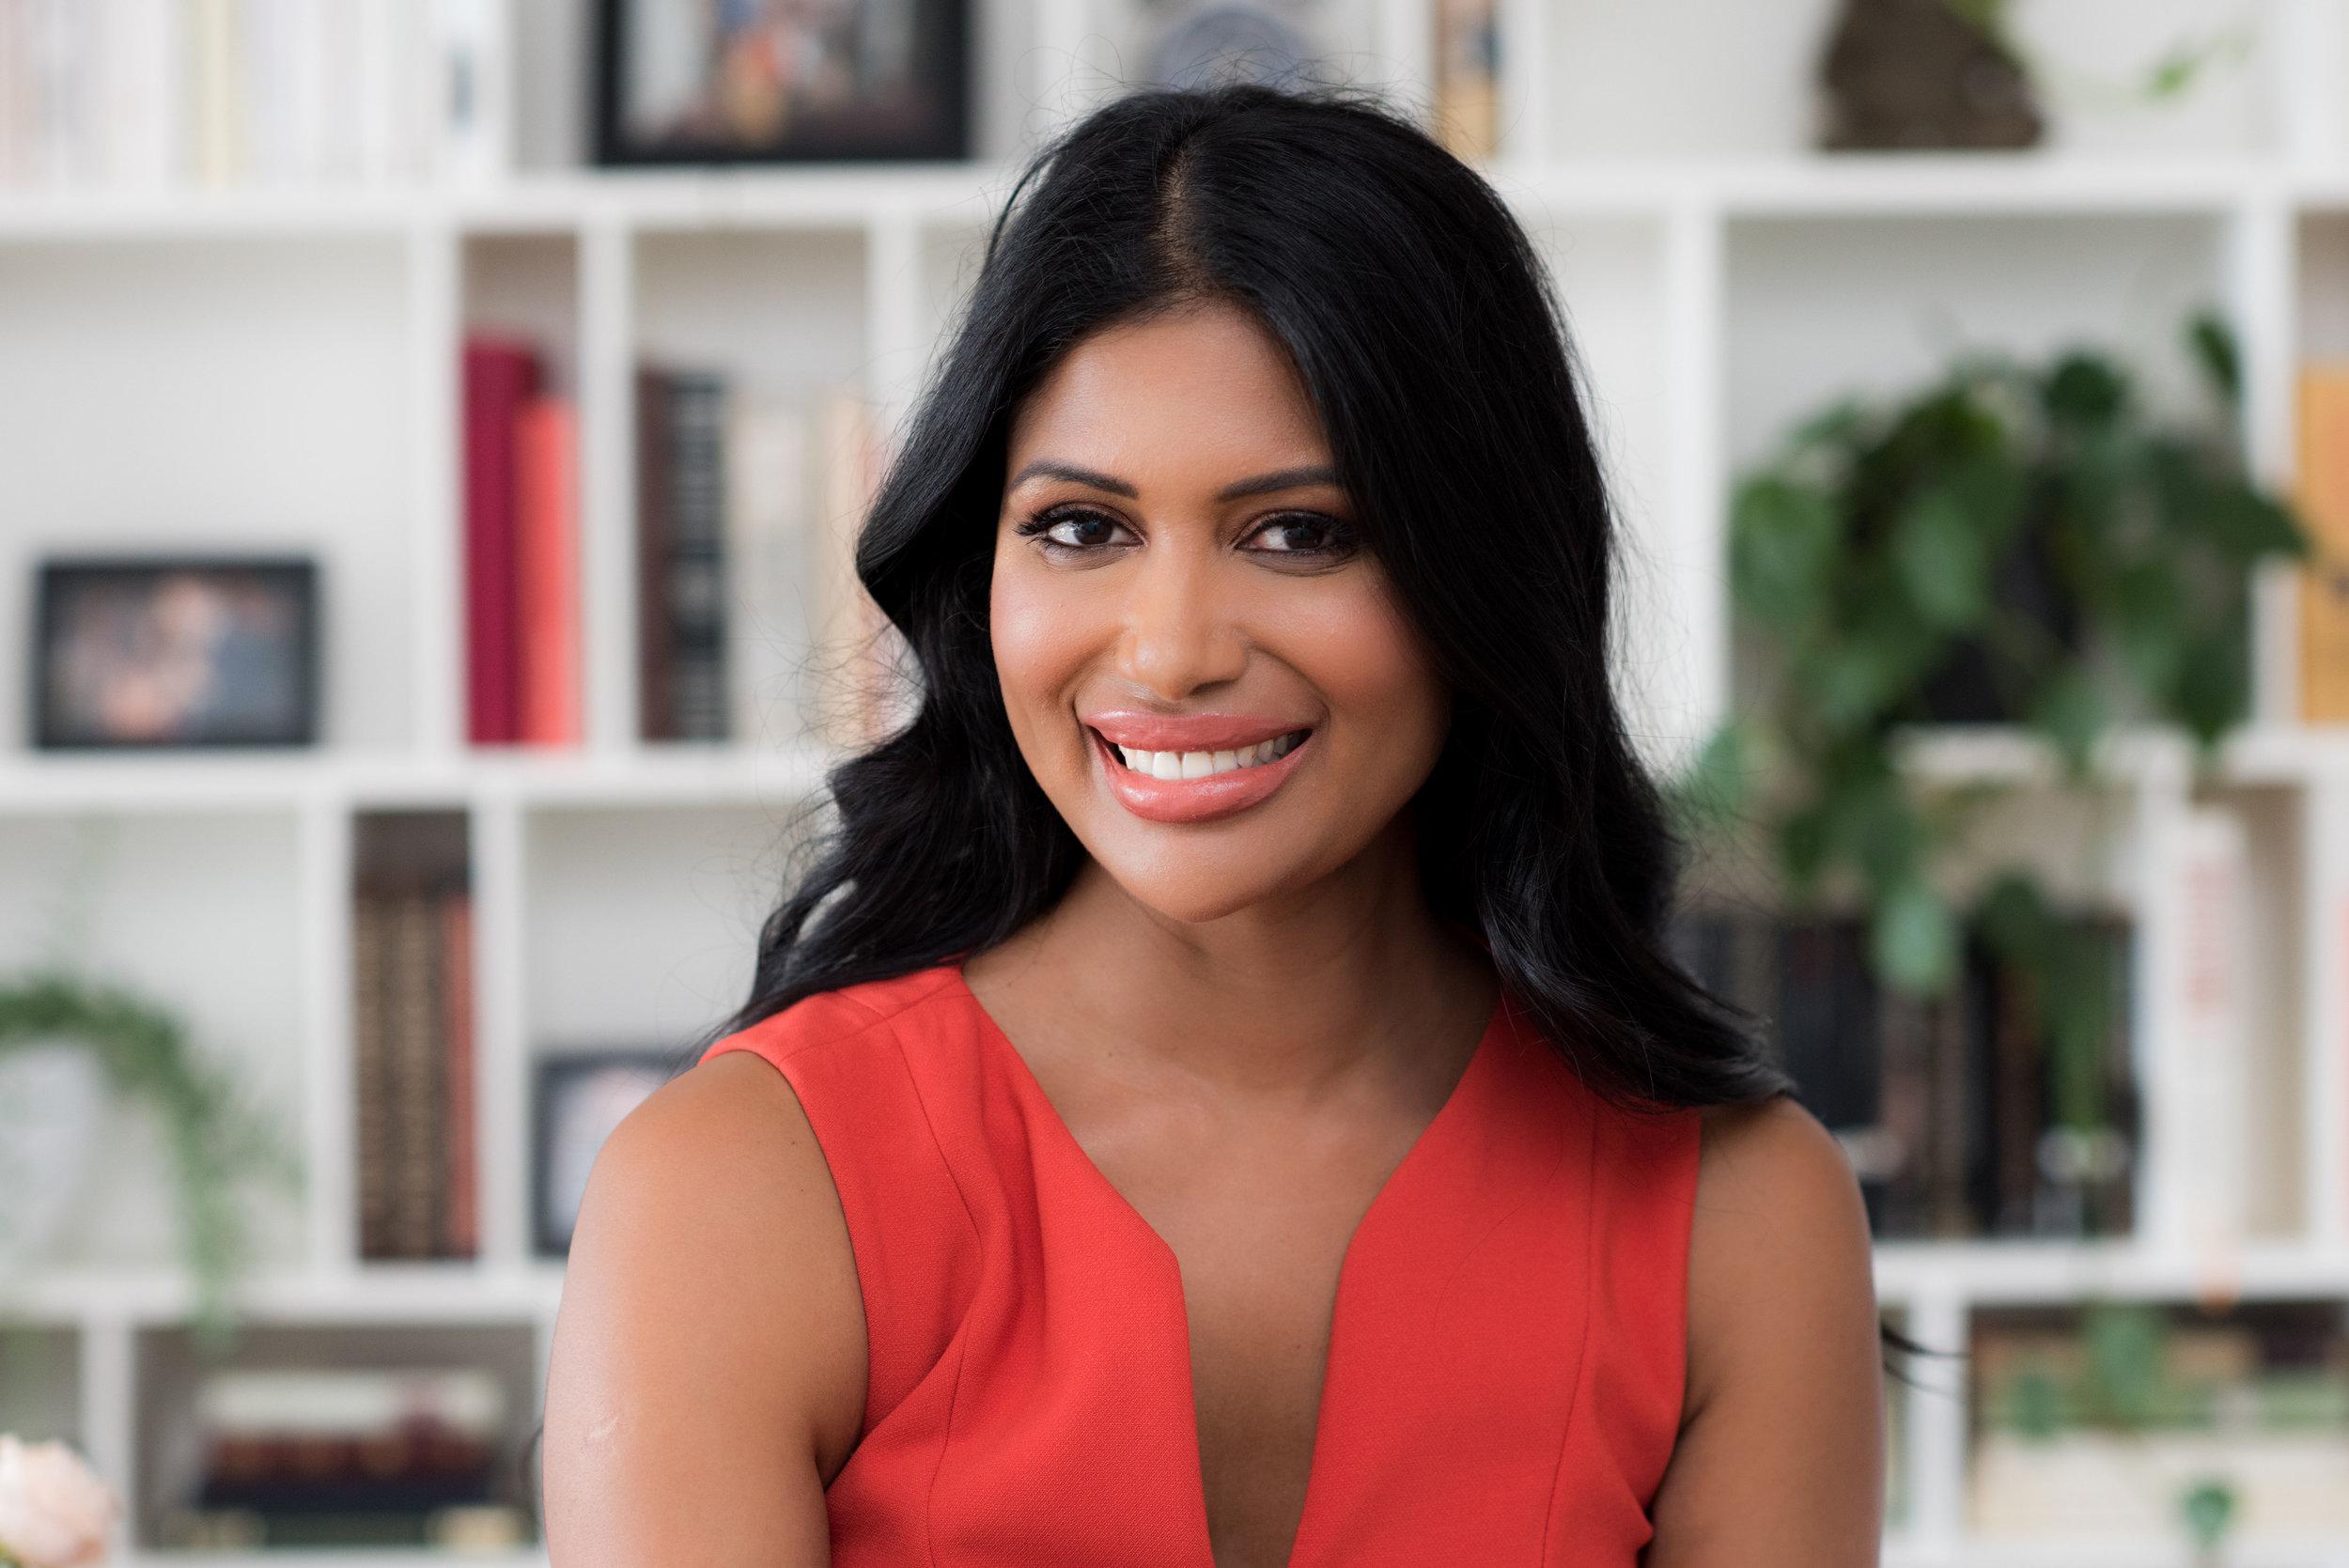 Shivani Gopal - CEO, The Remarkable Woman